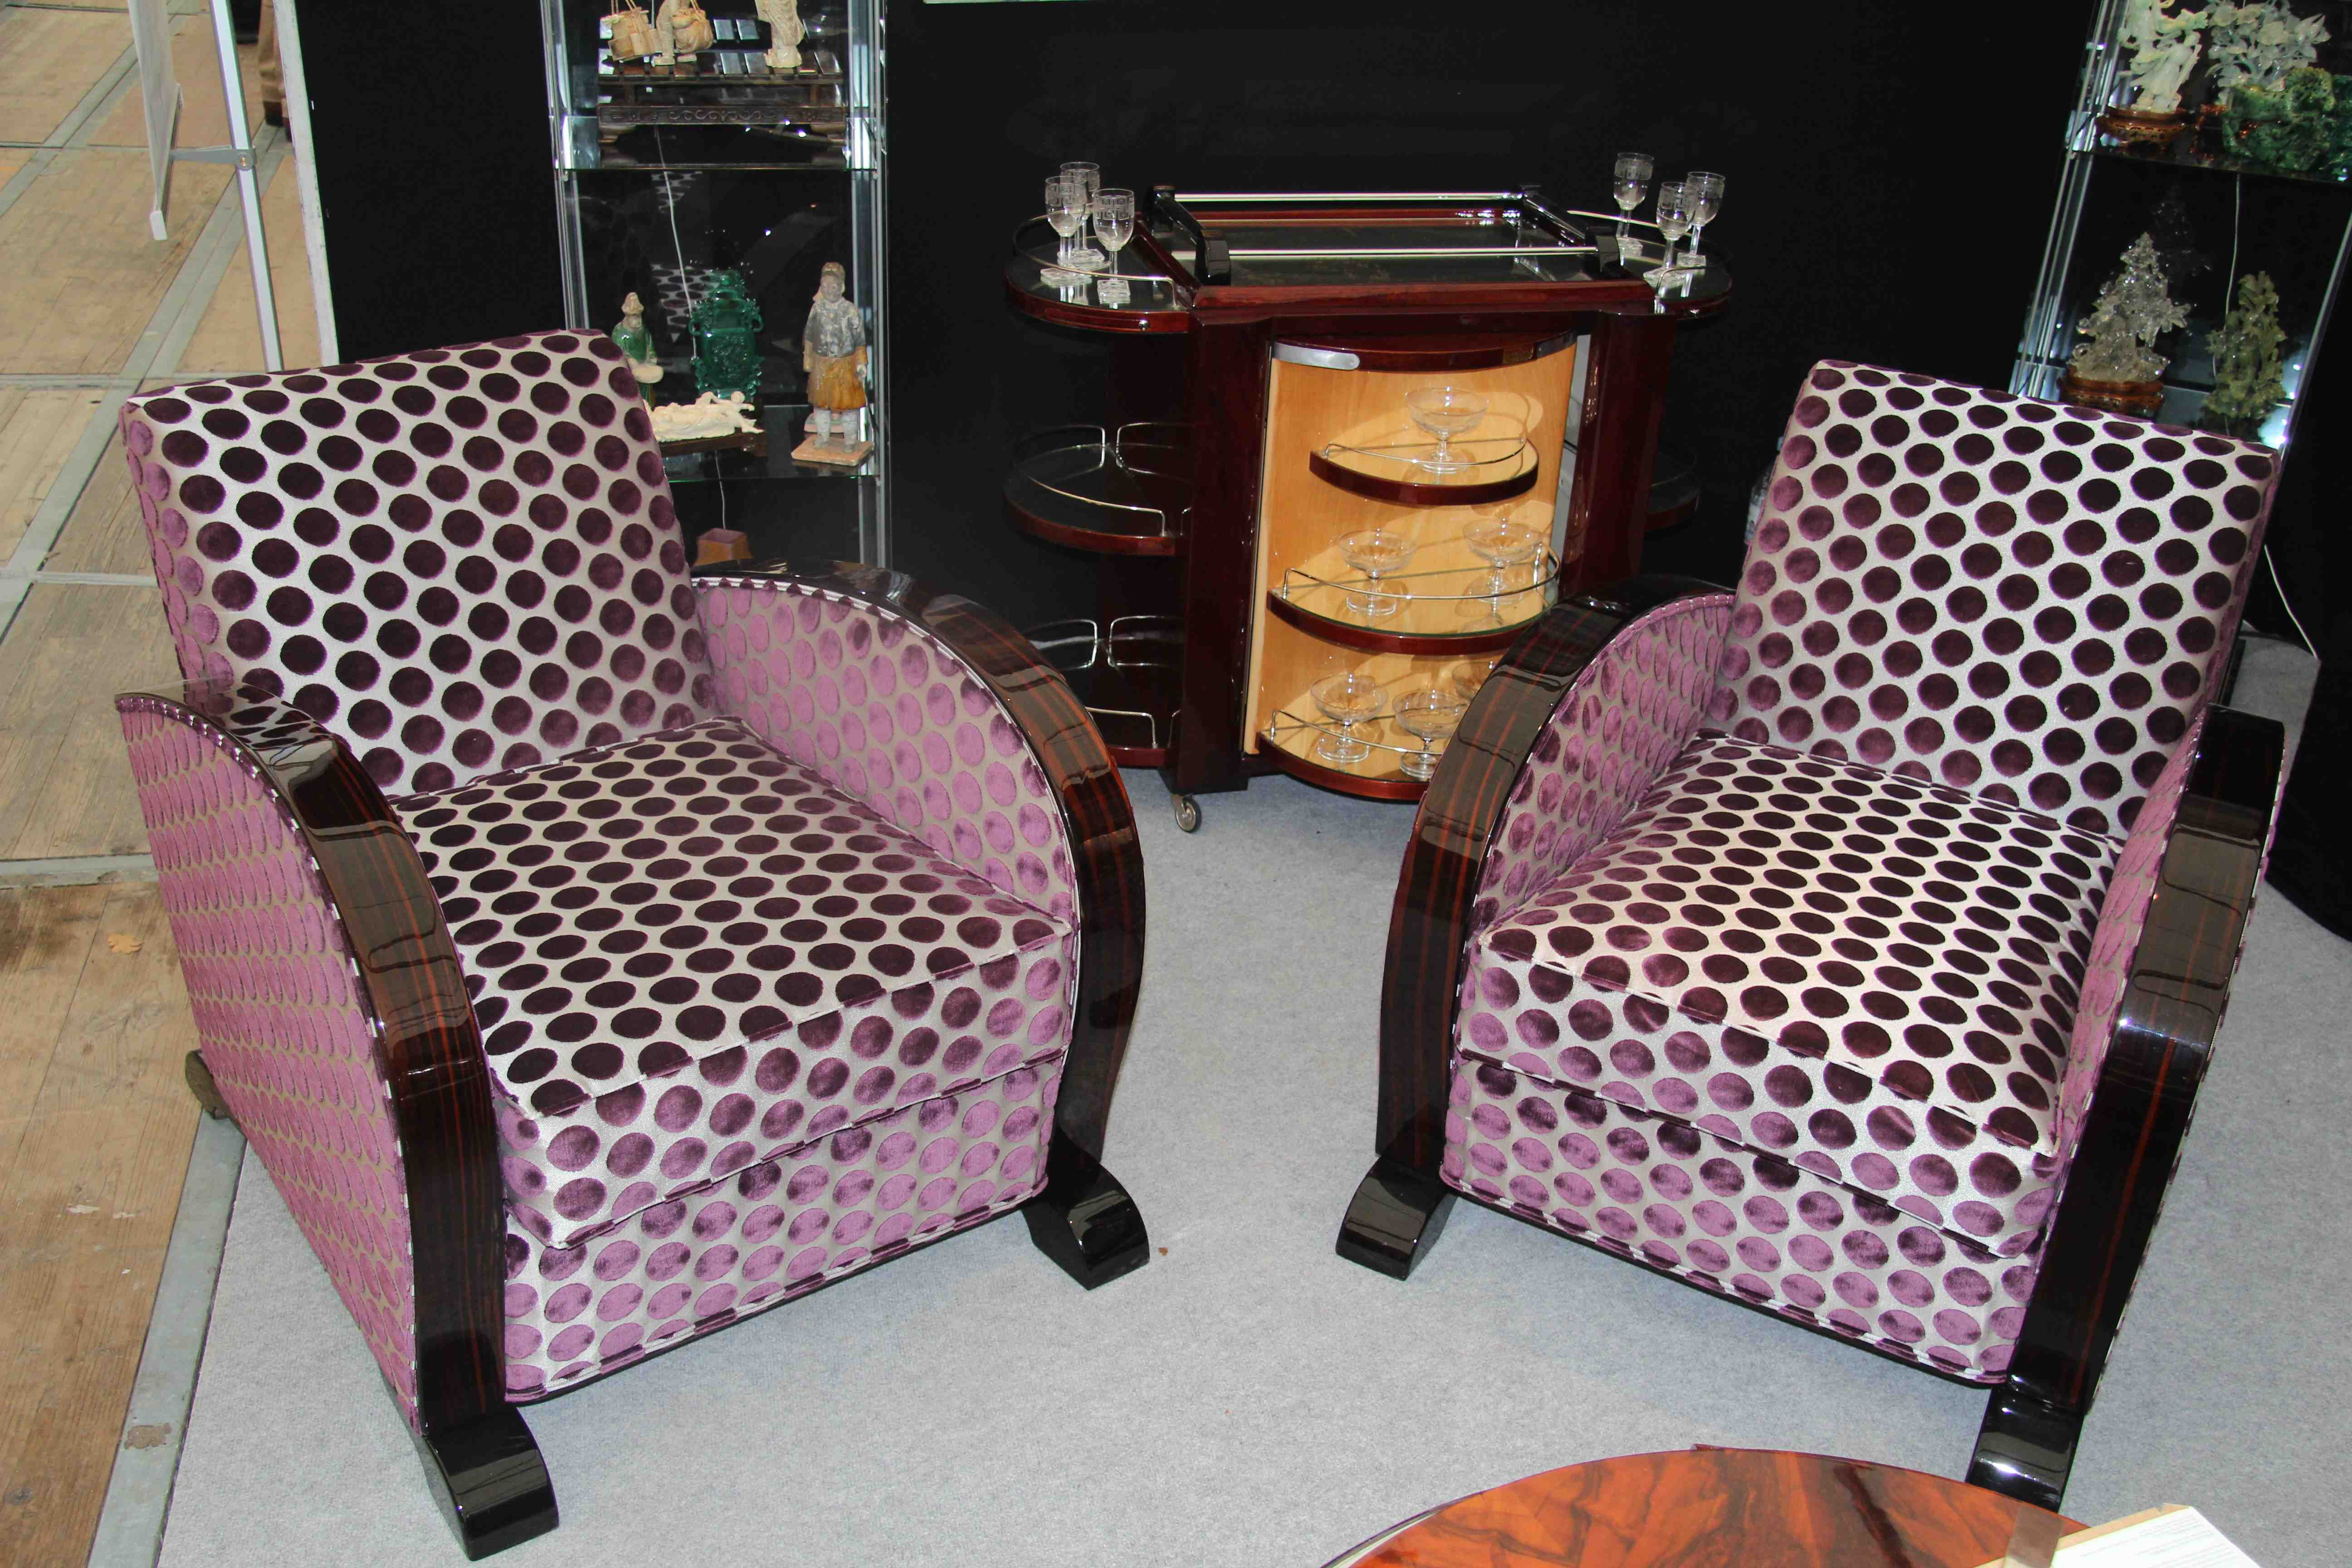 fauteuils club art deco b ne de macassar armchair club art deco esprit art d co vente. Black Bedroom Furniture Sets. Home Design Ideas